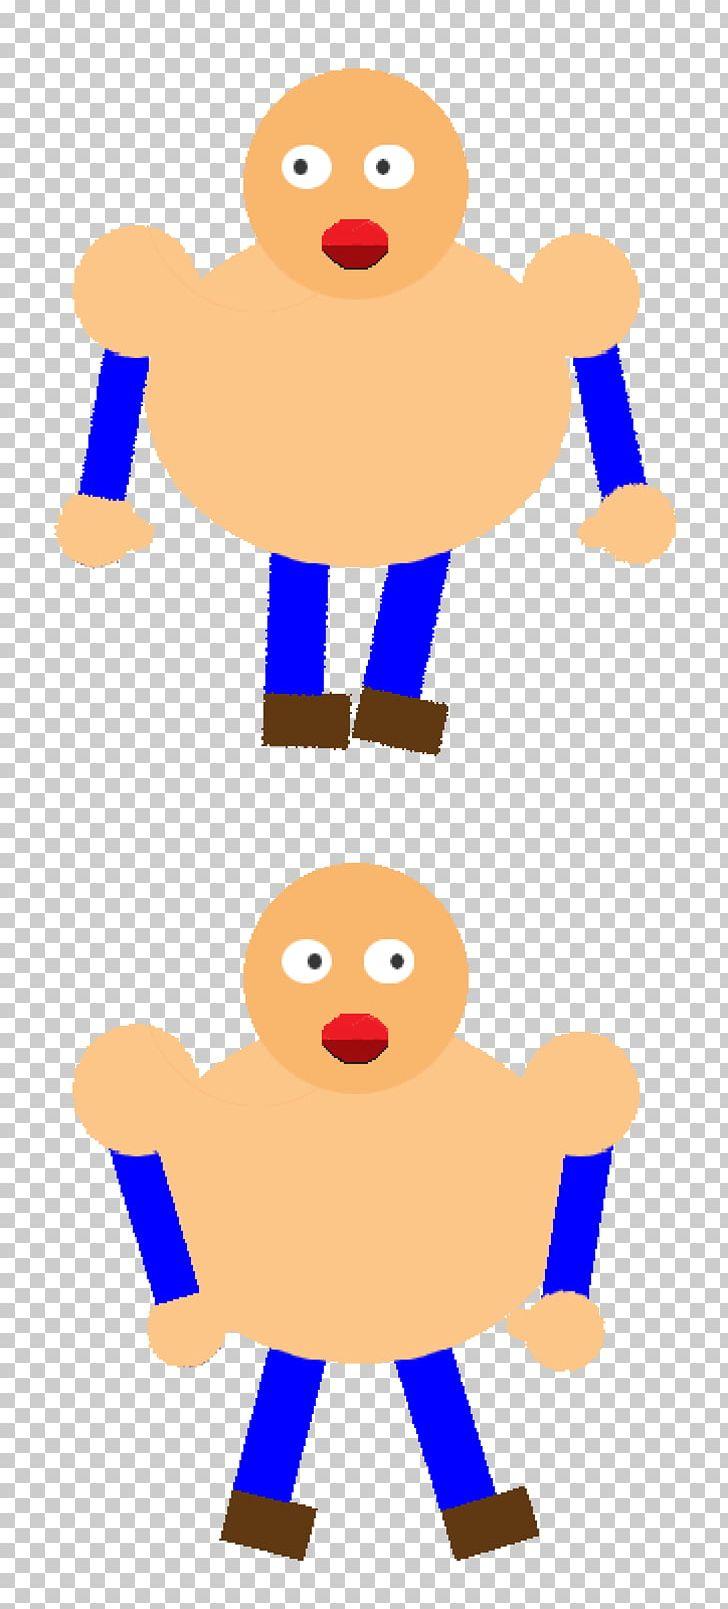 medium resolution of human behavior animation motion png clipart animation art behavior cartoon homo sapiens free png download